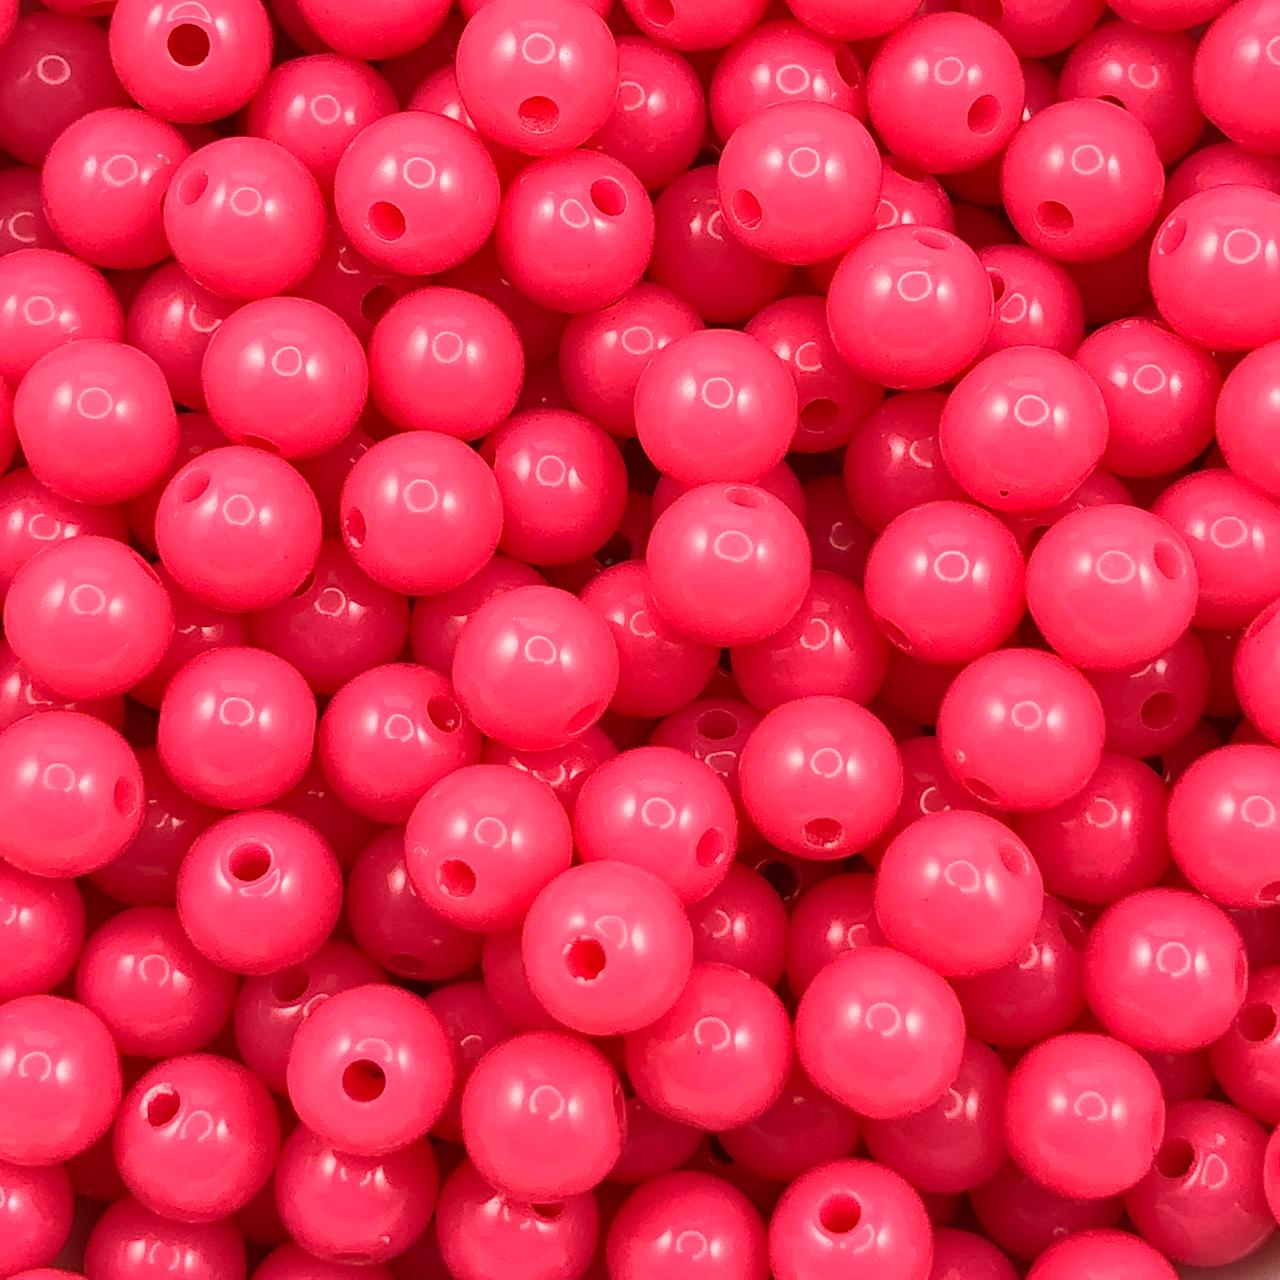 BOL653 - Bola Plástica Rosa Pink 8mm - 20Grs